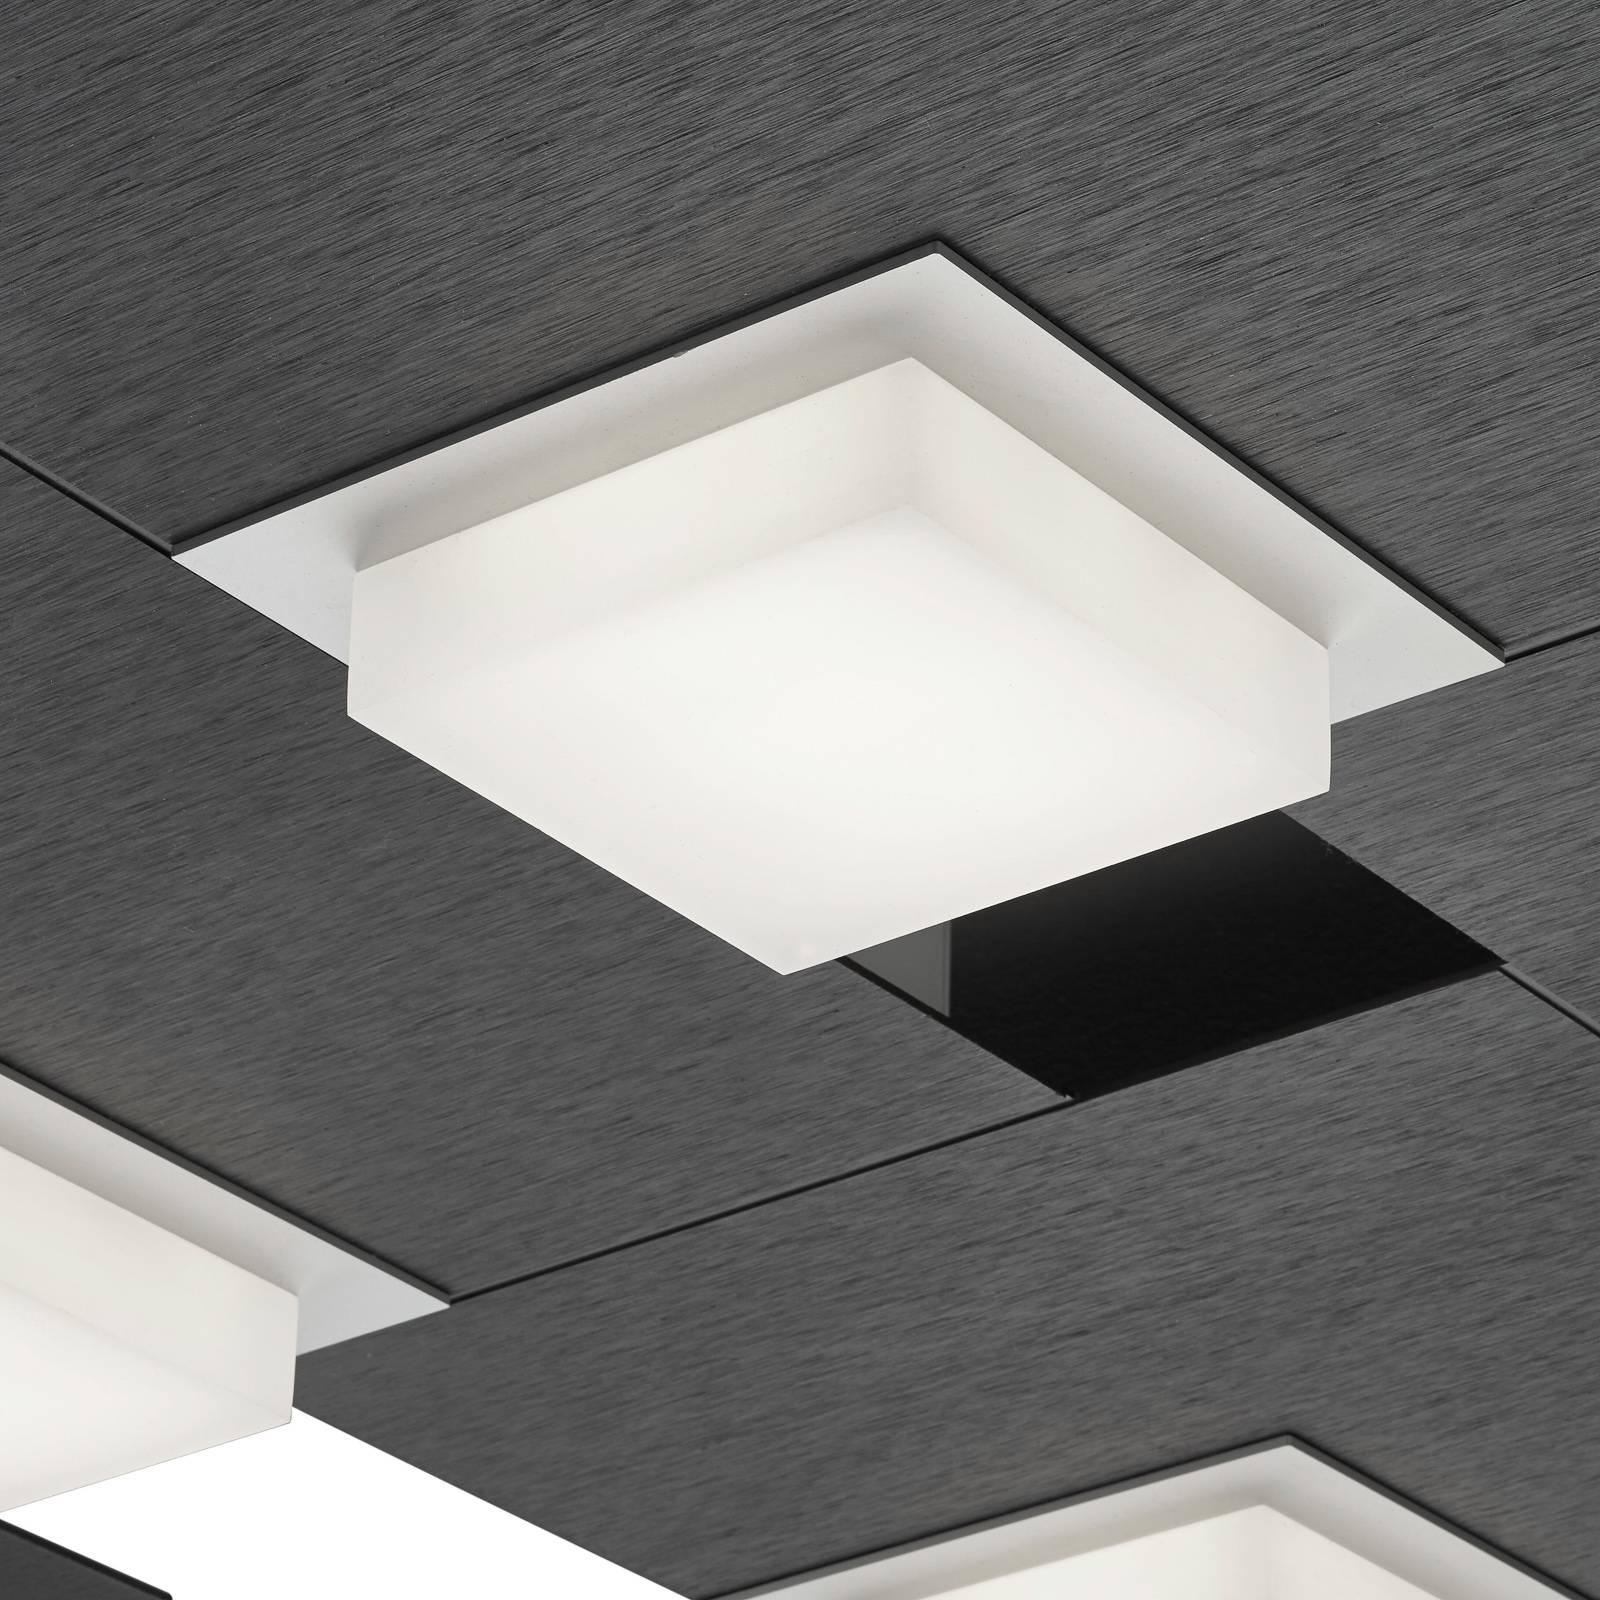 BANKAMP Quadro LED-kattovalaisin 64W, antrasiitti